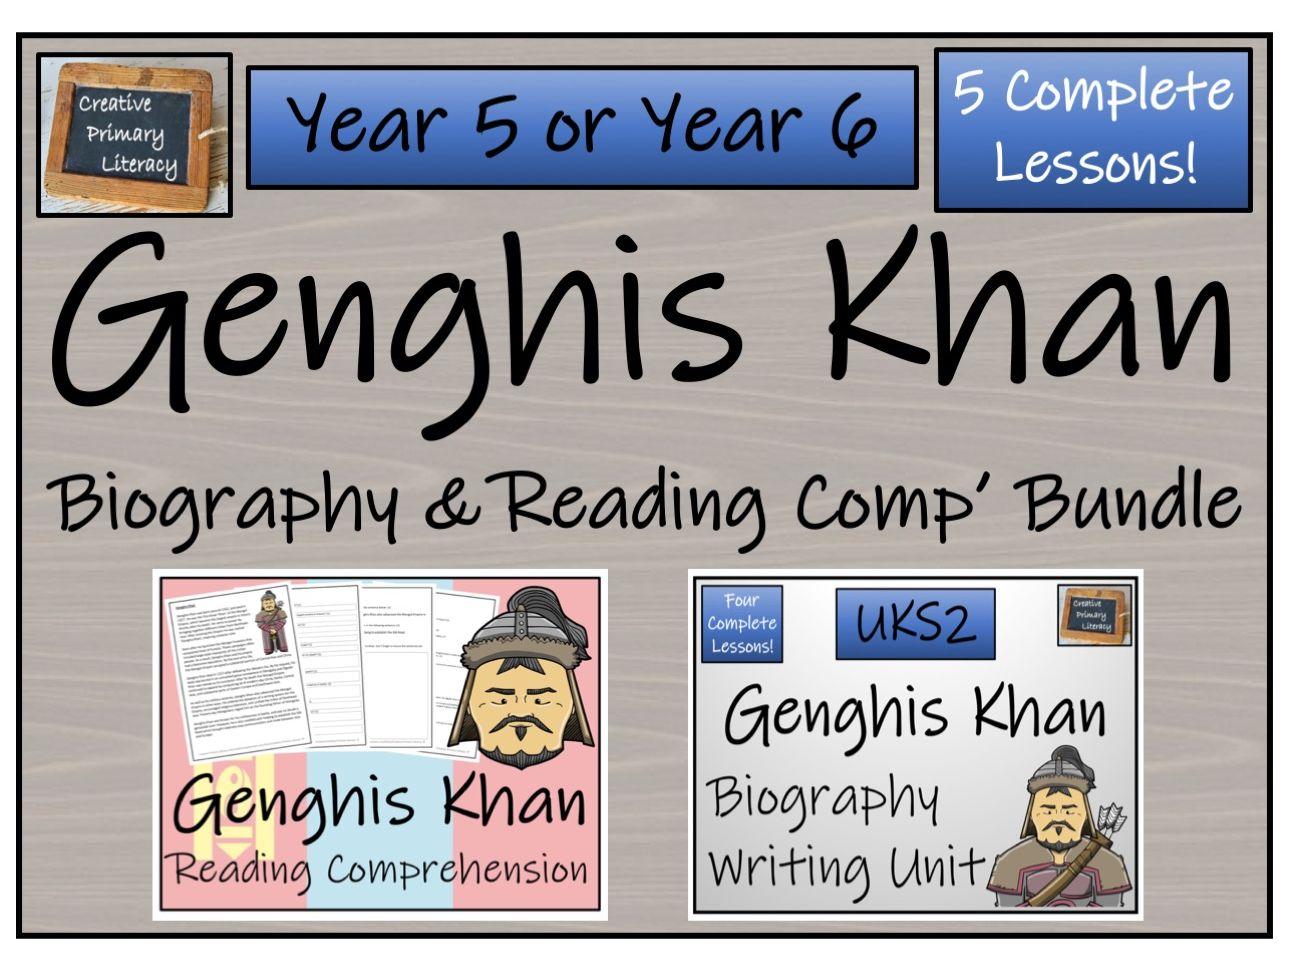 UKS2 History - Genghis Khan  Reading Comprehension & Biography Bundle